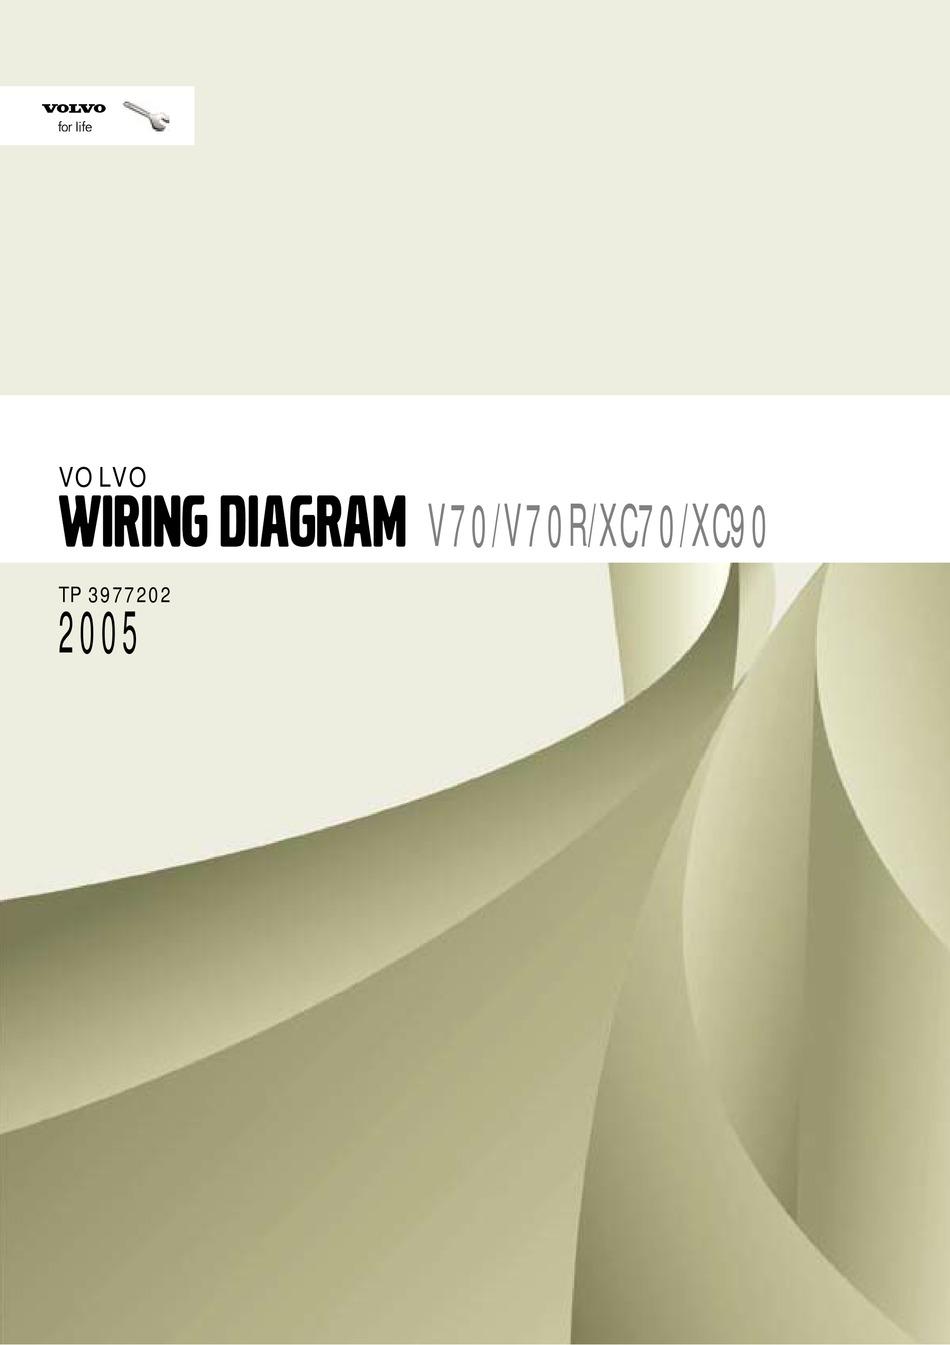 VOLVO V70 2005 WIRING DIAGRAMS Pdf Download | ManualsLib | Volvo S70 Wiring Diagram Pdf |  | ManualsLib